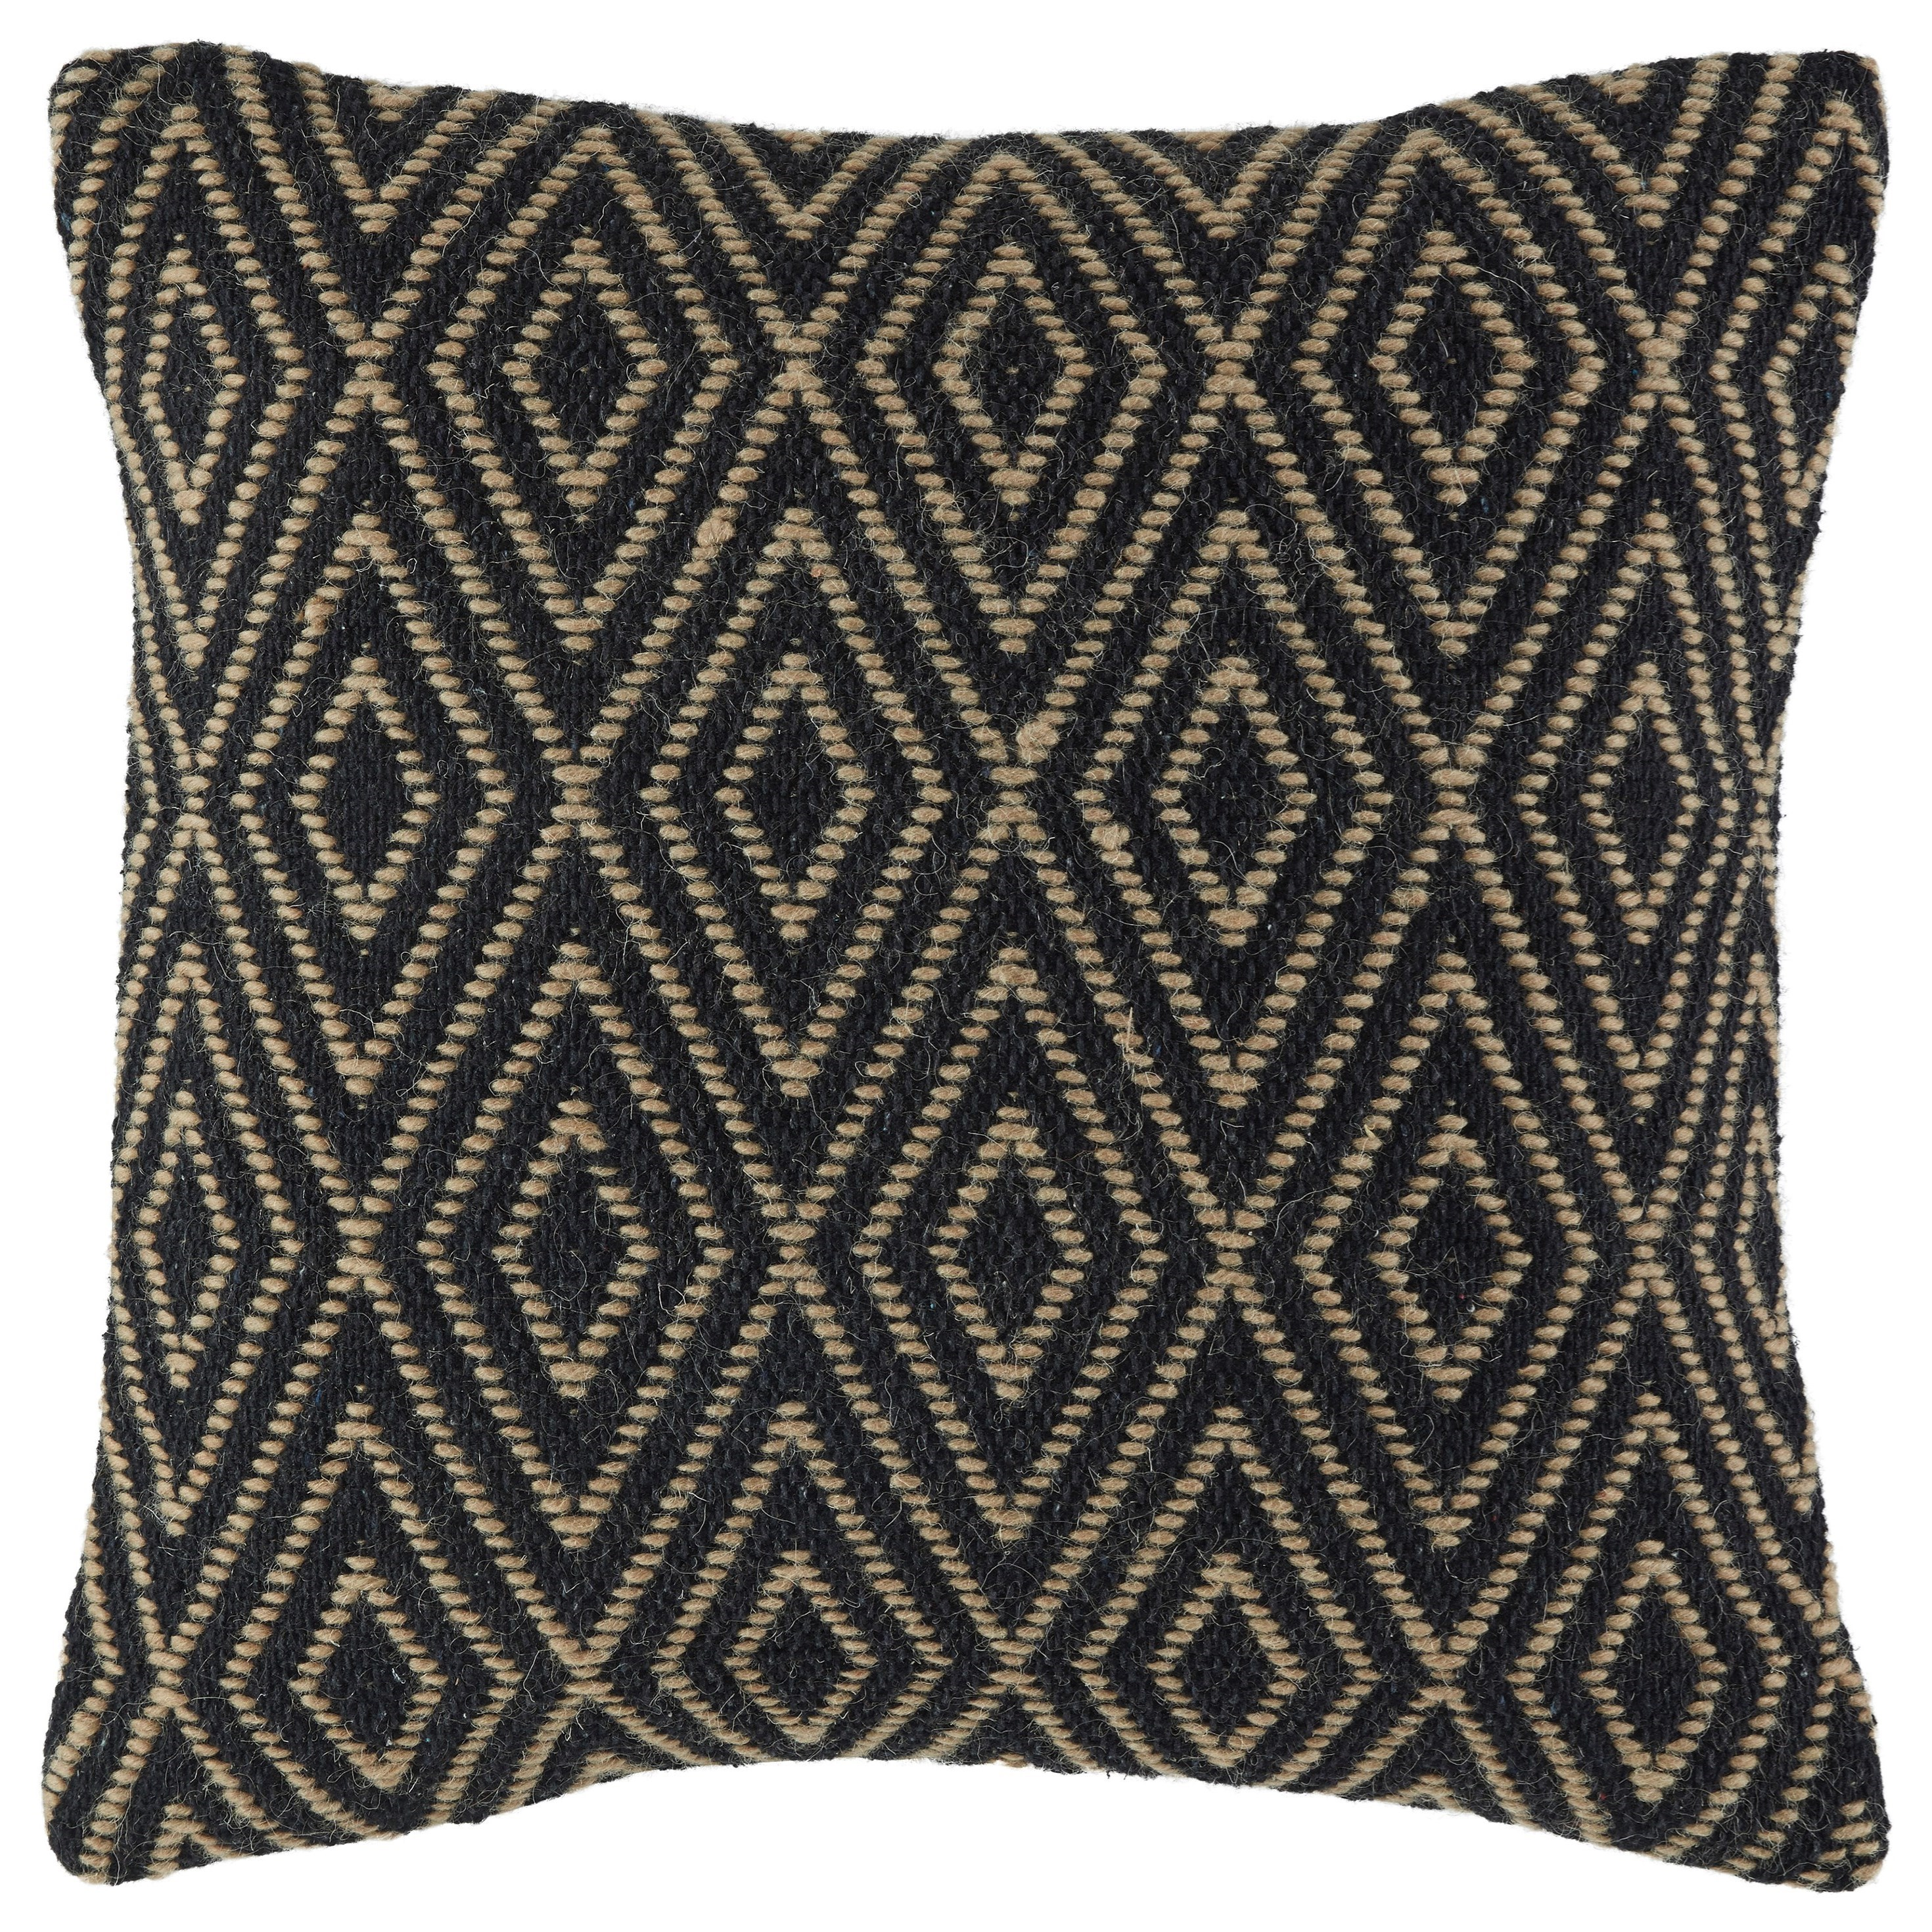 Signature Design by Ashley Pillows Mitt Black/Tan Pillow | Rife's